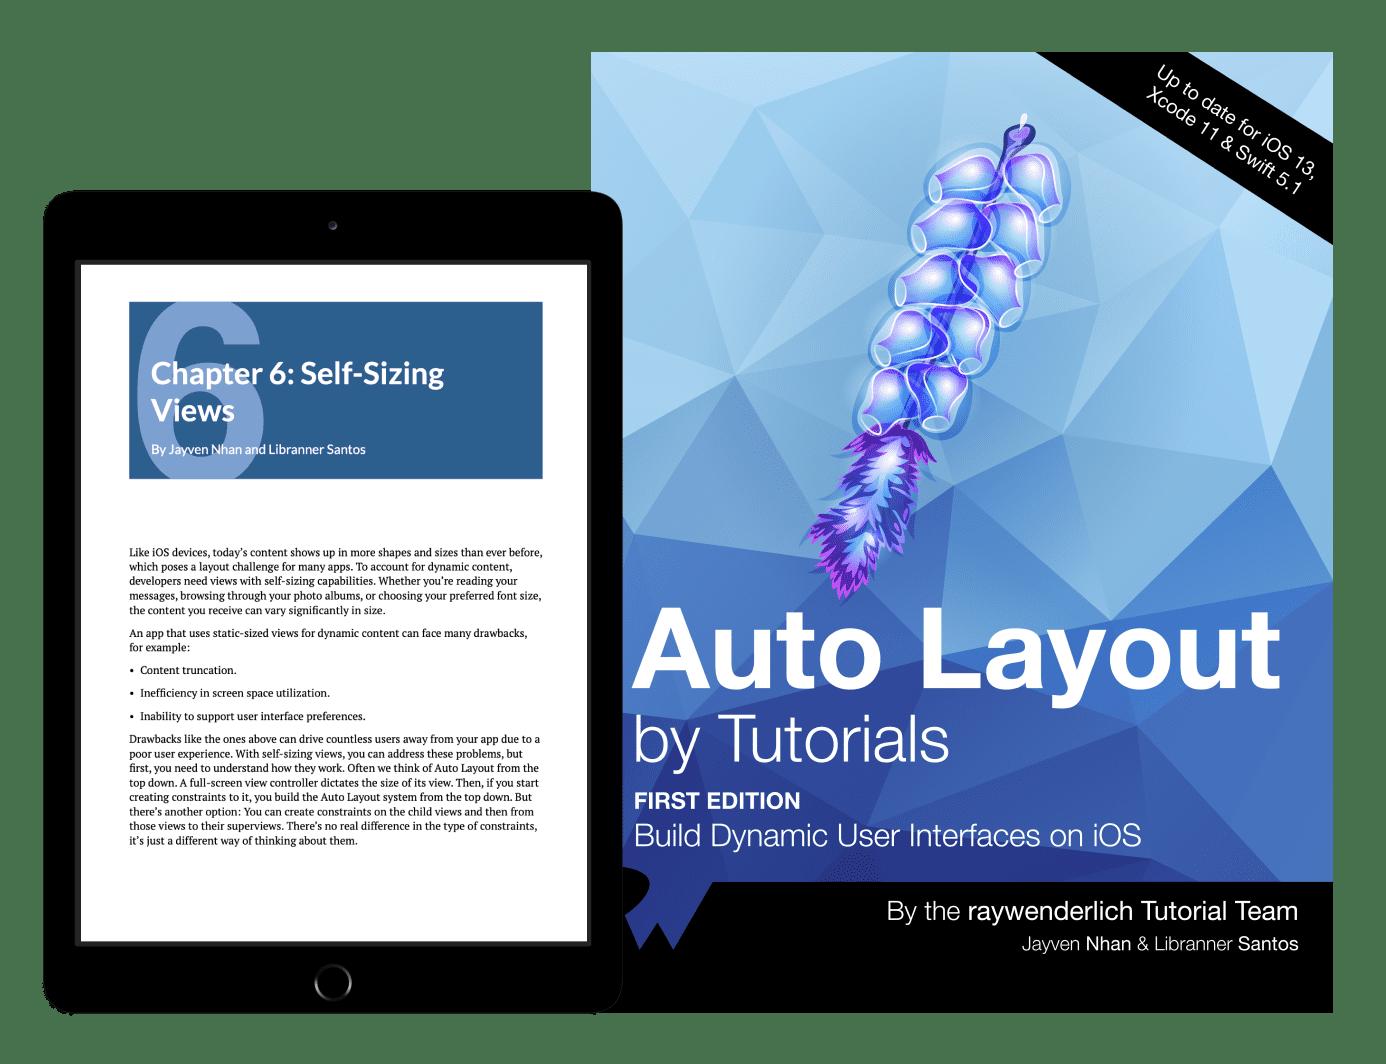 Auto Layout by Tutorials